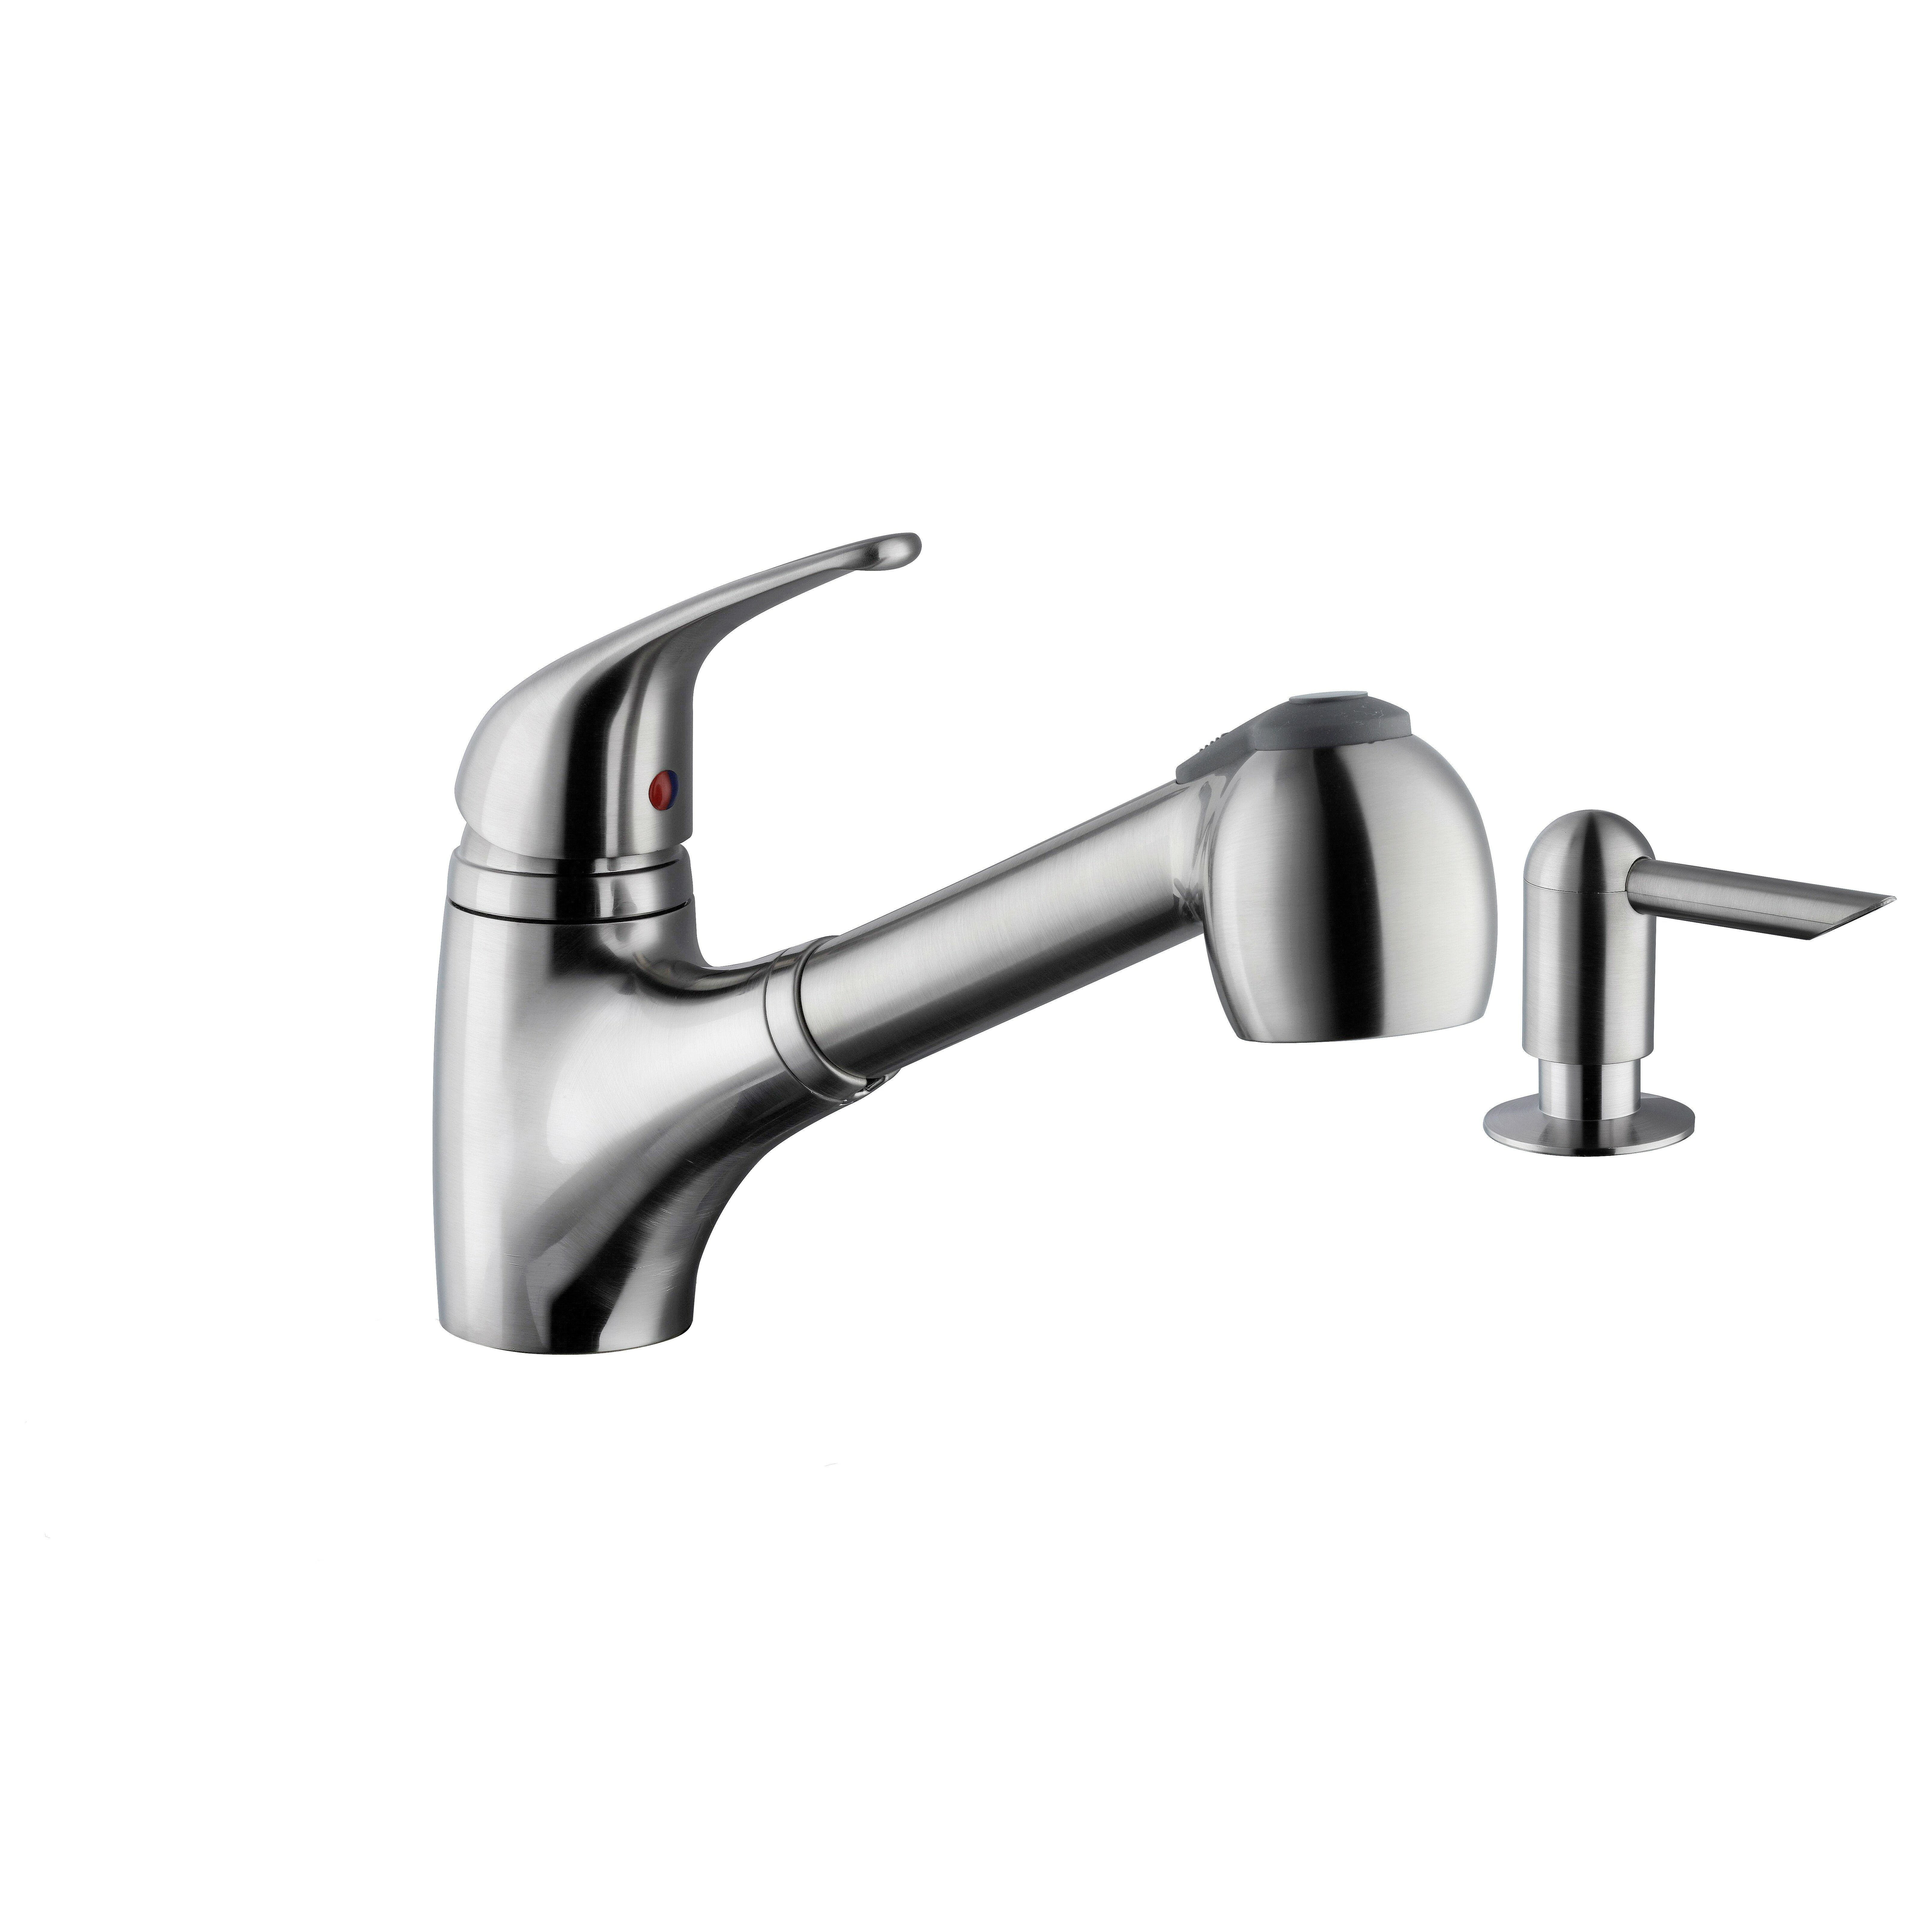 Grohe Alira Kitchen Faucet Low Profile Kitchen Faucet 28 Images Low Profile